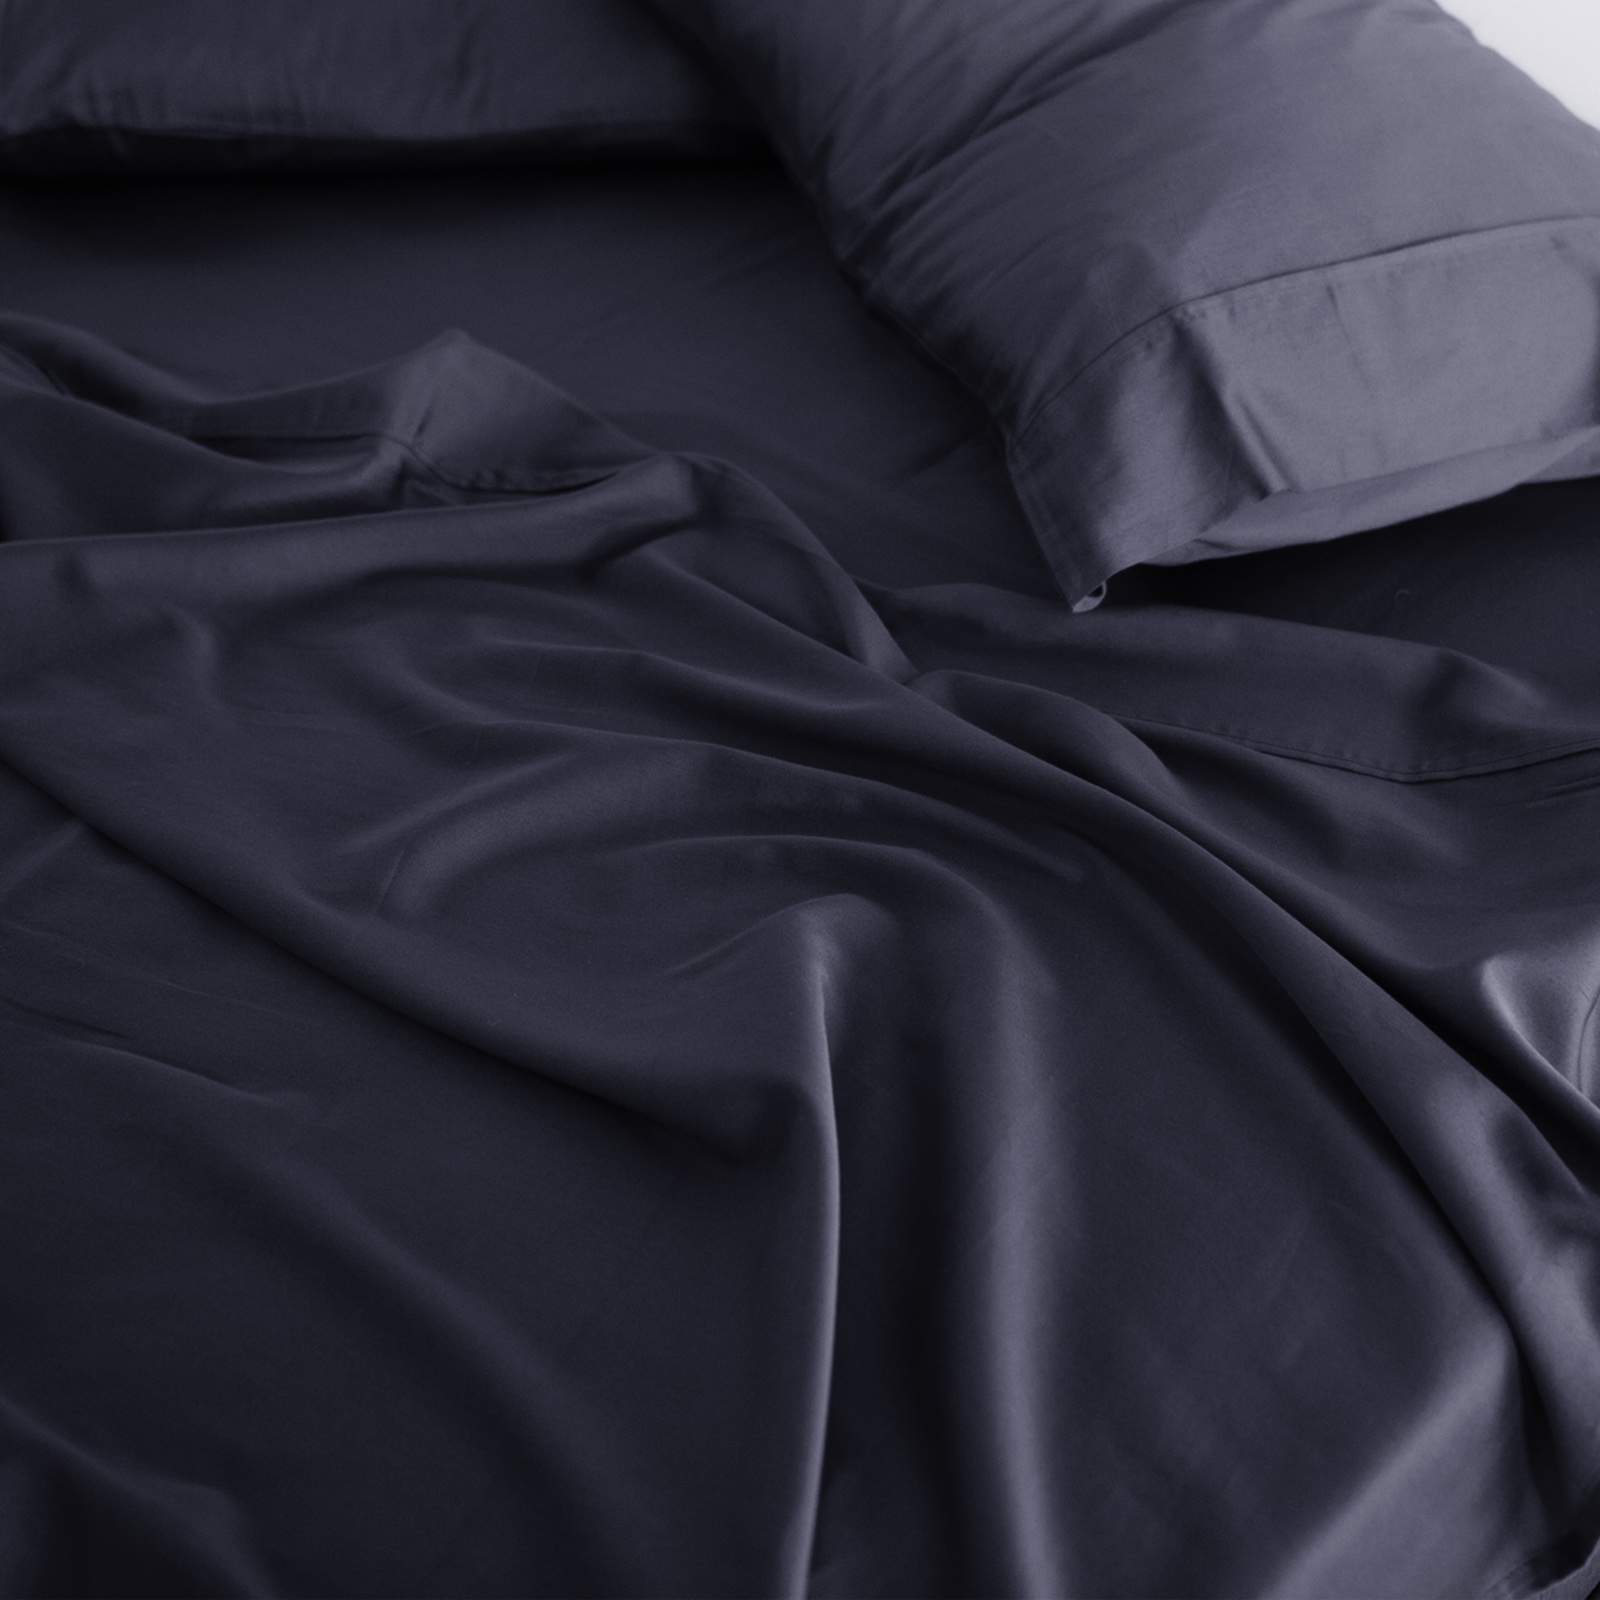 thumbnail 30 - Royal Comfort 1000TC Hotel Grade Bamboo Cotton Sheets Pillowcases Set Ultrasoft